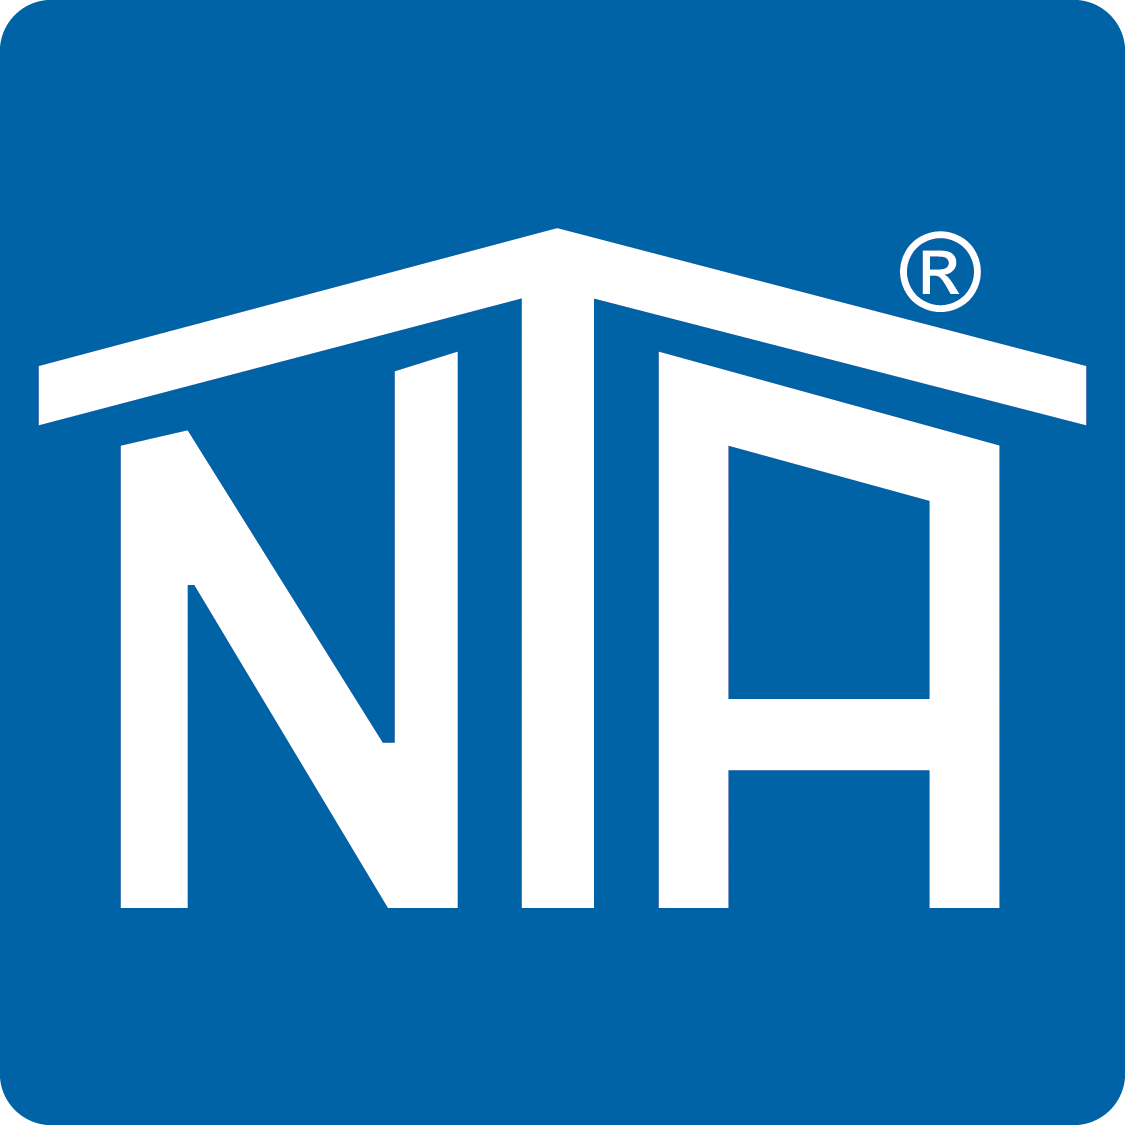 David R. Tompos, Founder Of NTA, Joins THIA Board